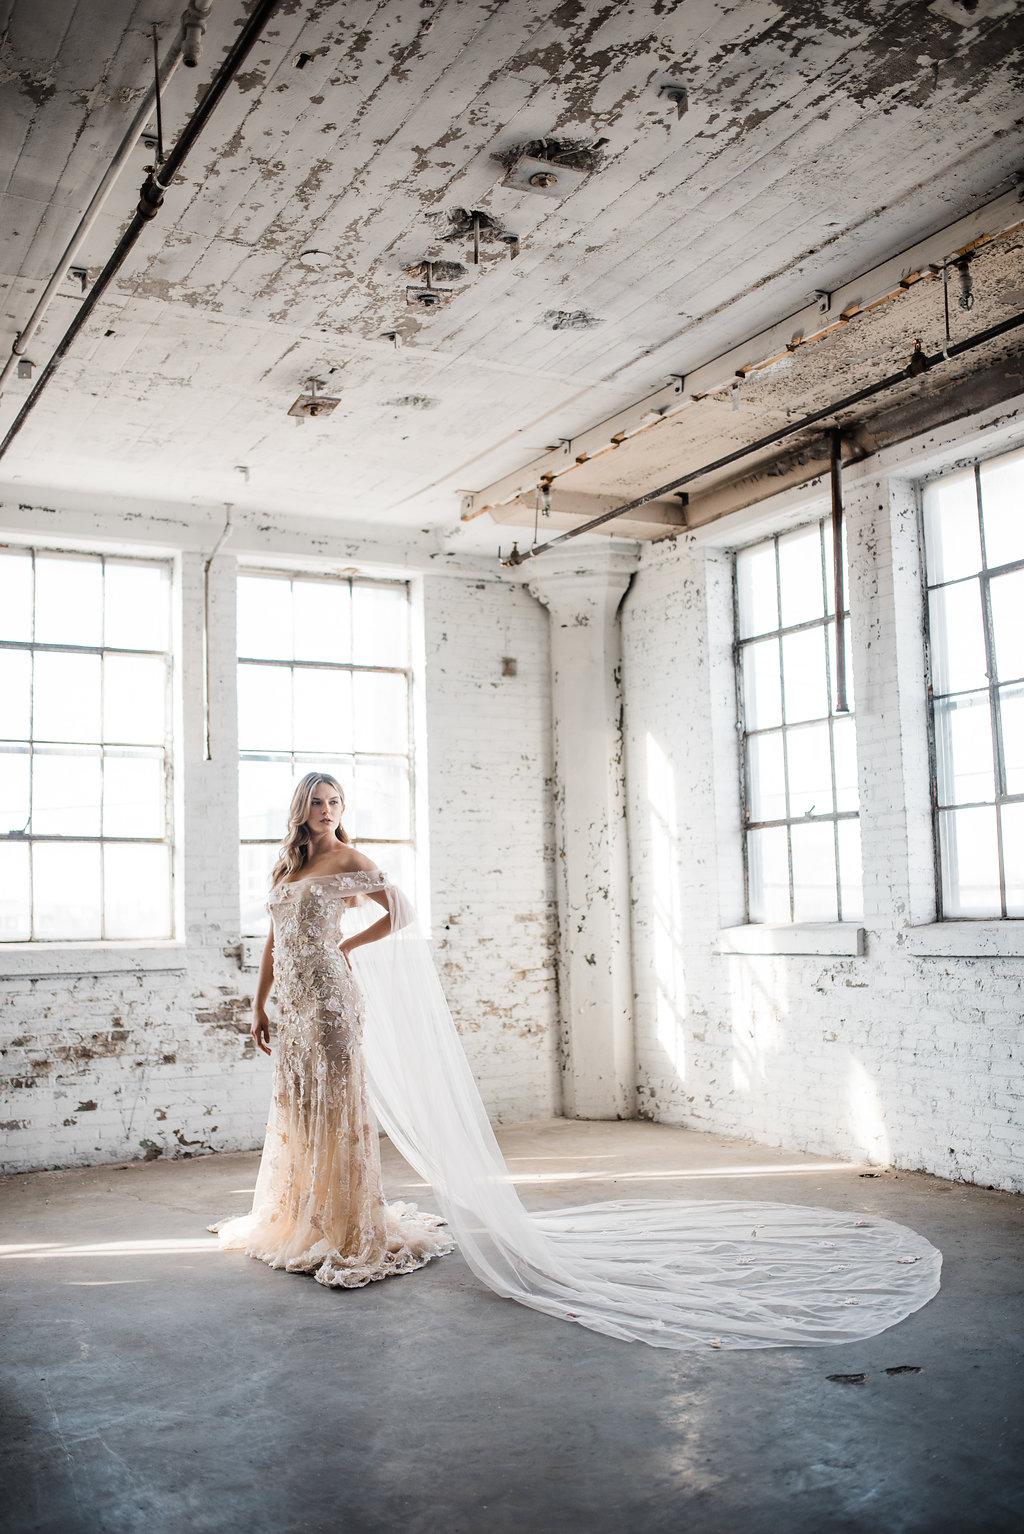 Galia-Lahav-StyledShoot-Chelsea-Hall-Photography-Dayton-OH-79.jpg